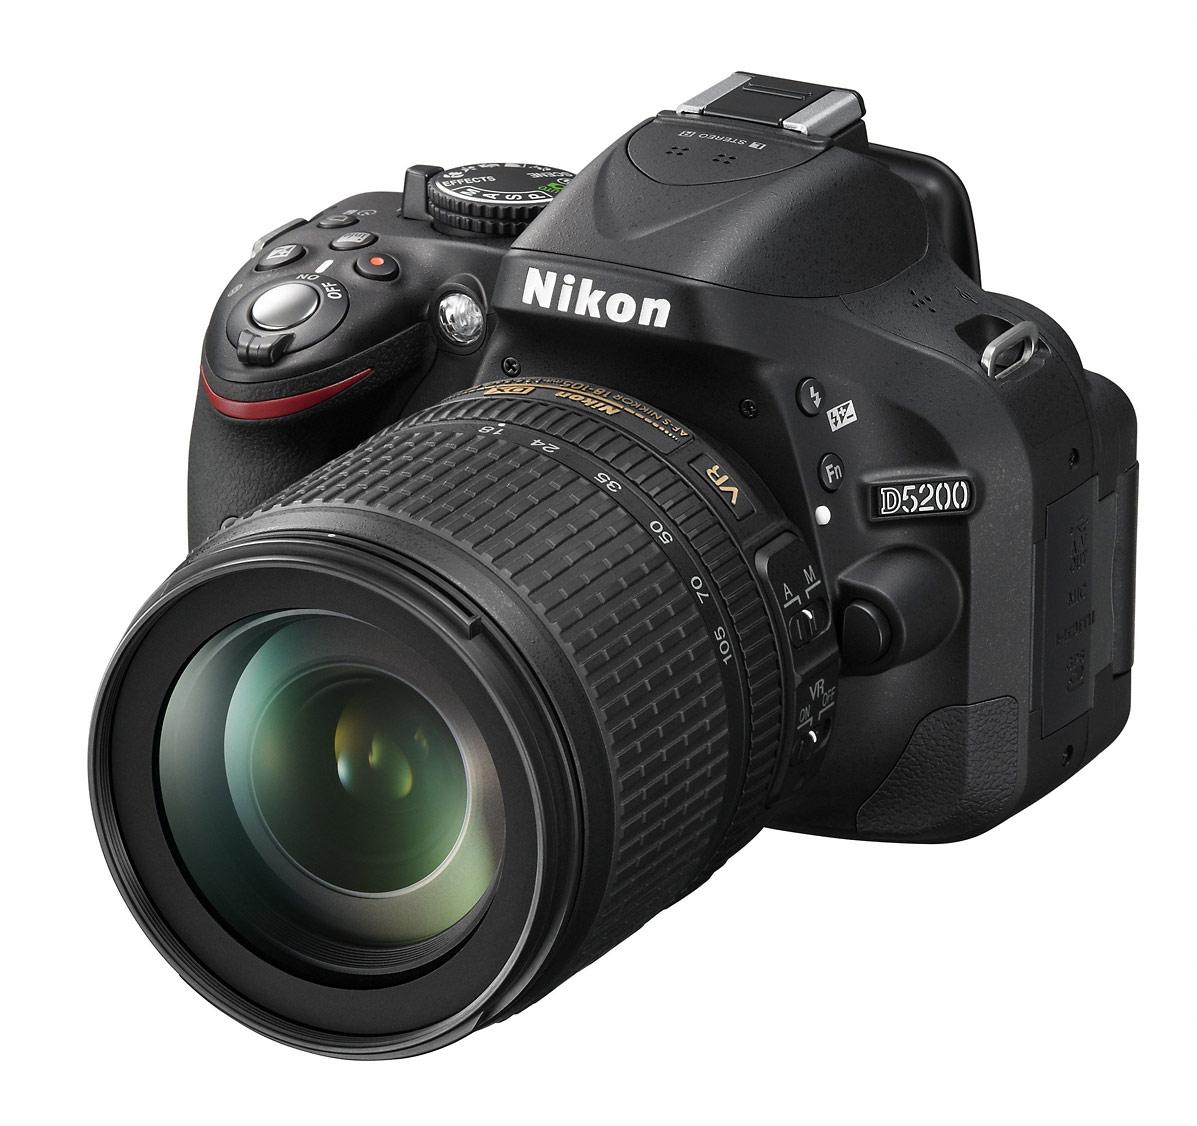 Nikon D5200 Digital SLR - Upper Left